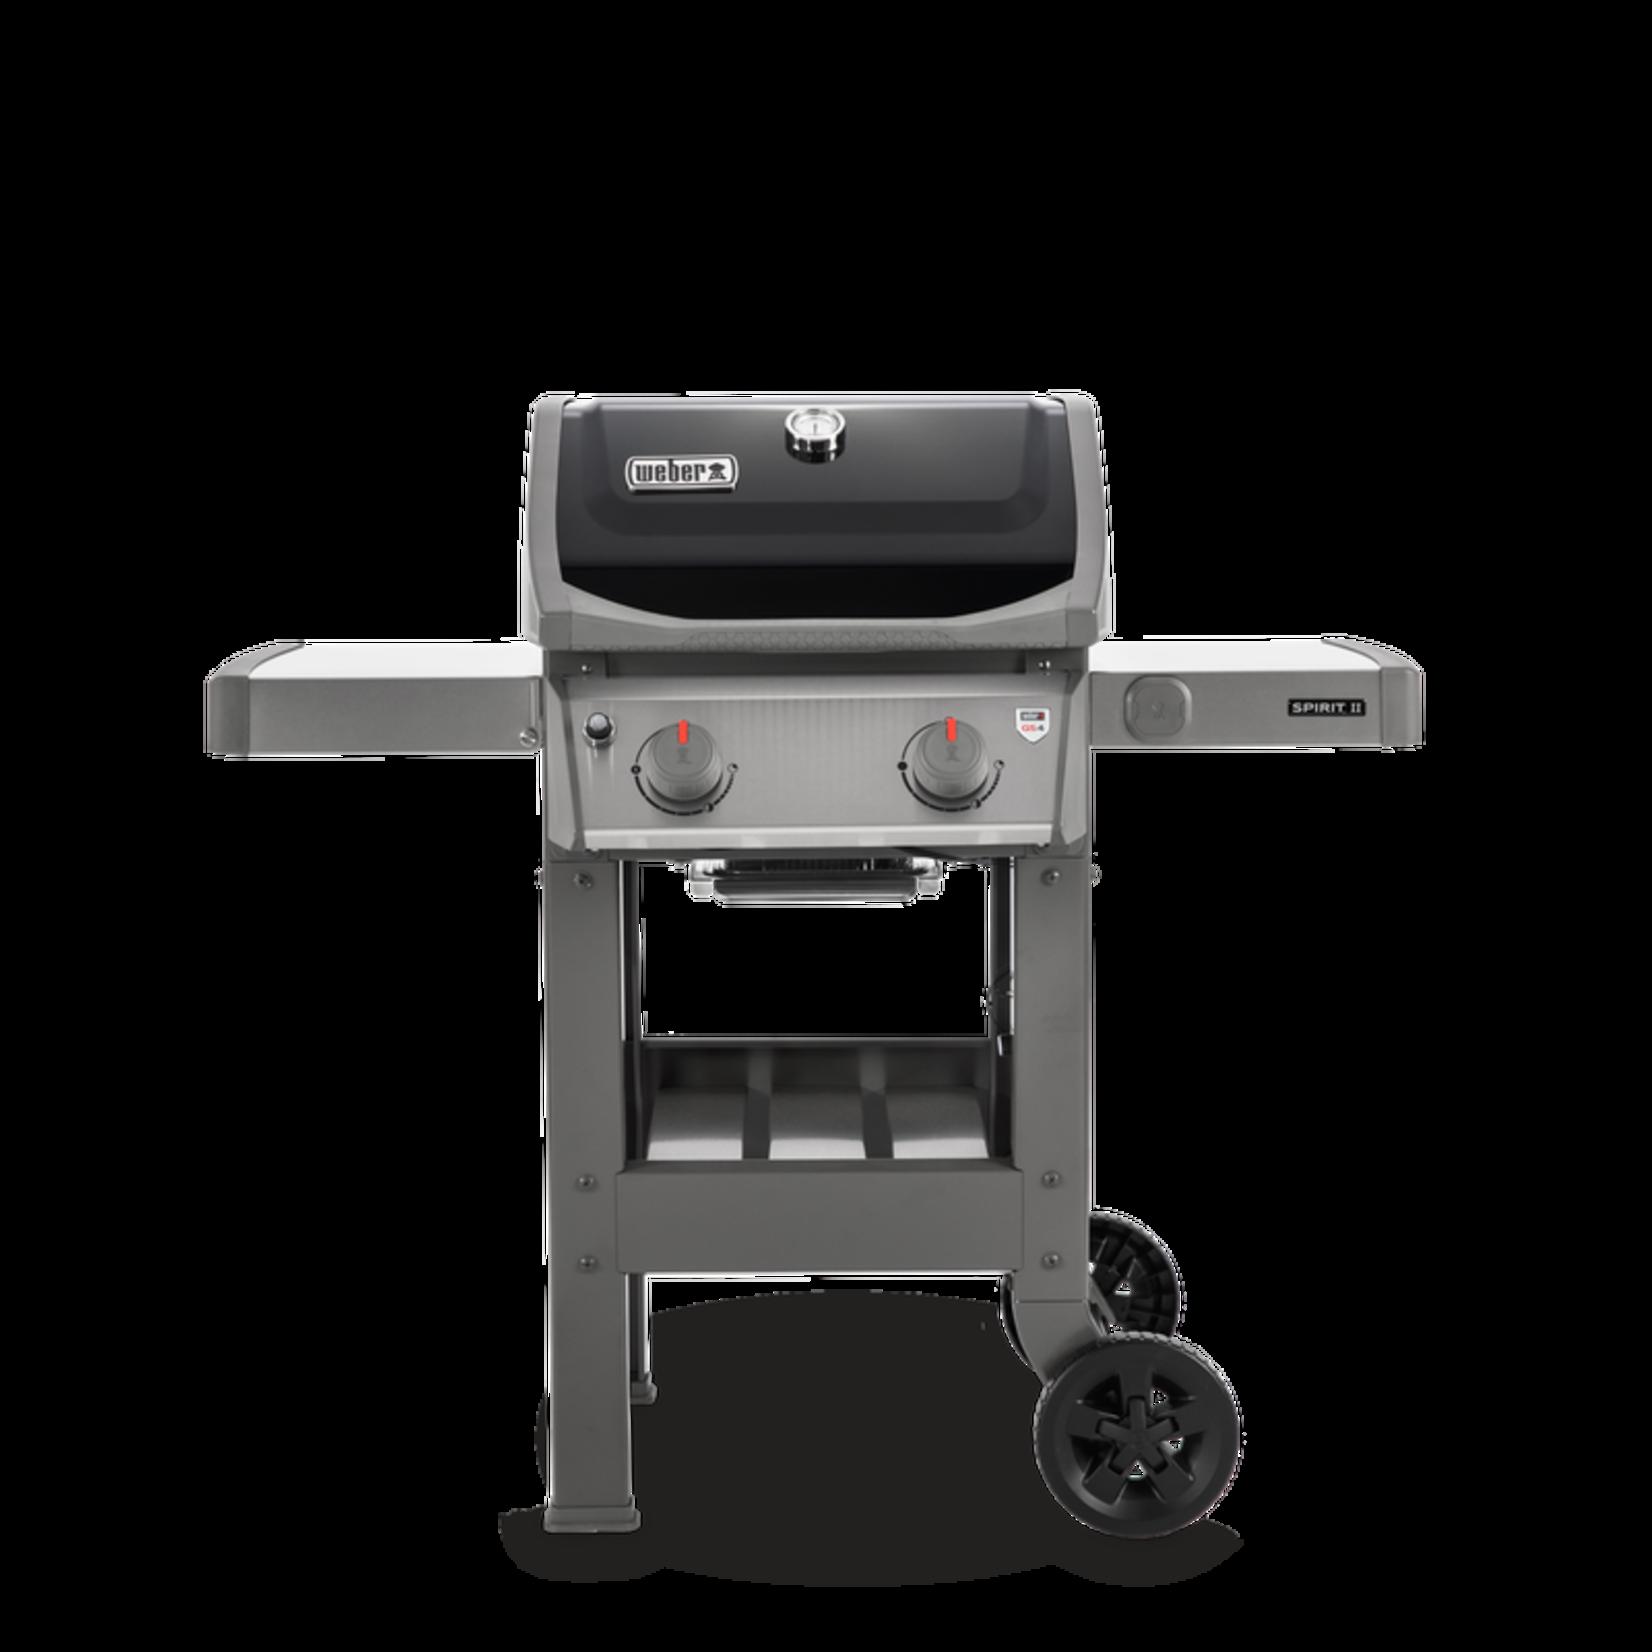 Weber Weber Spirit II E-210 GBS gasbarbecue zwart. Grilloppervlakte 51x46cm